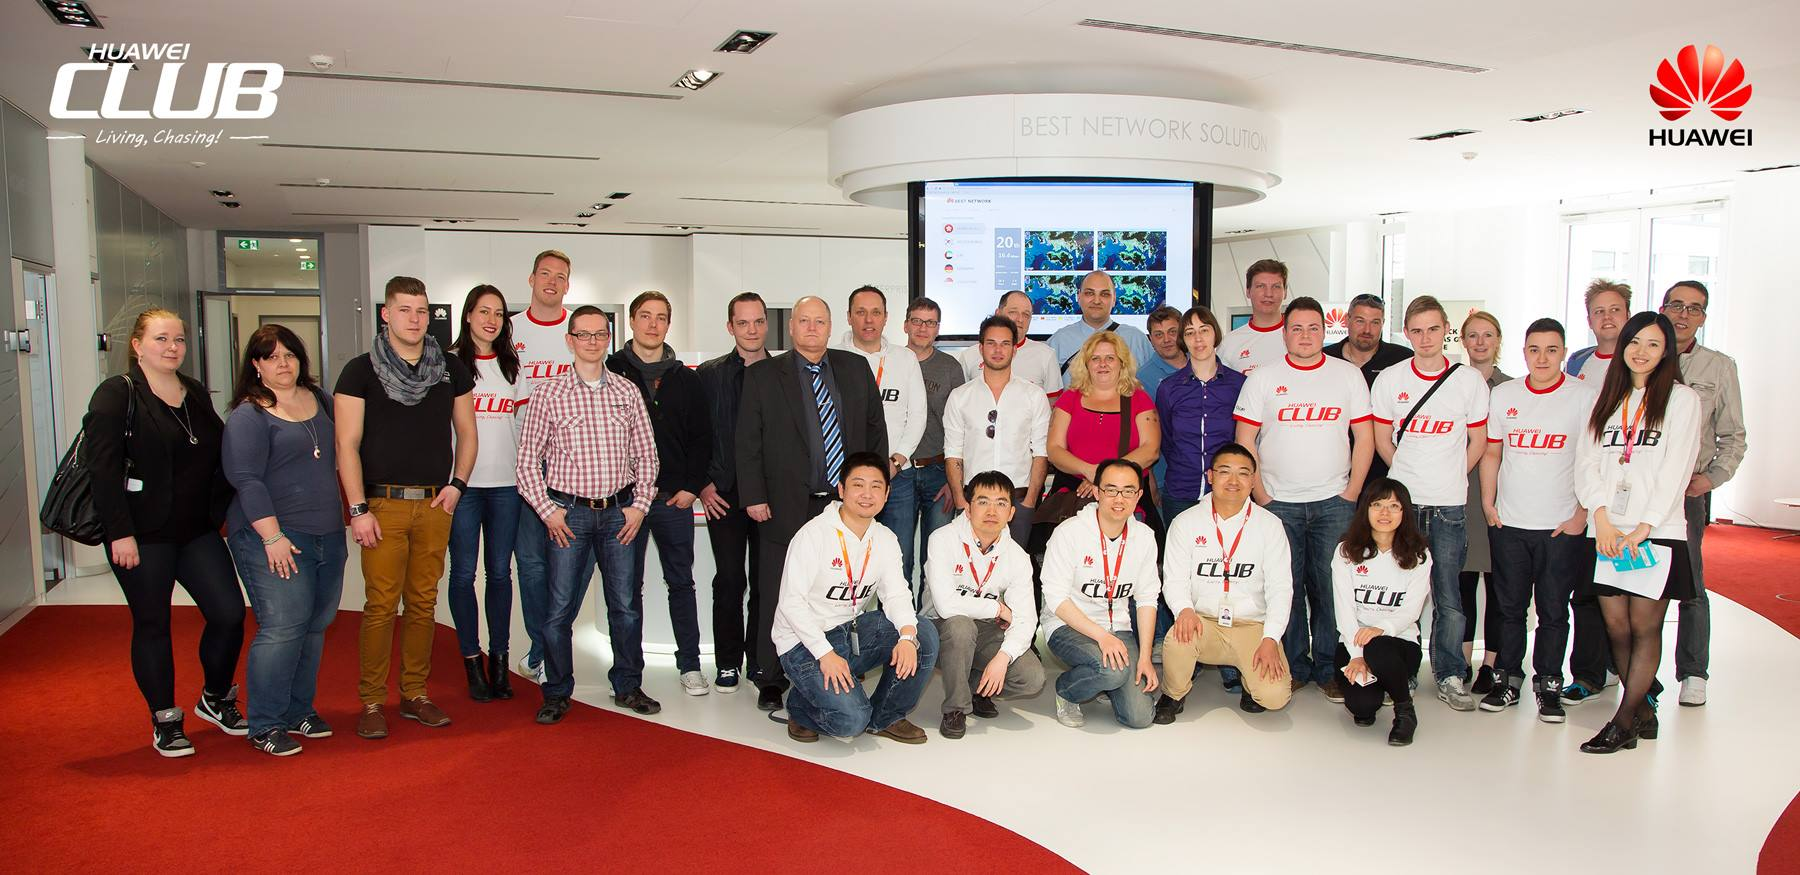 Photo of Huawei P8 Hands-On Event in der Huawei Europazentrale Düsseldorf